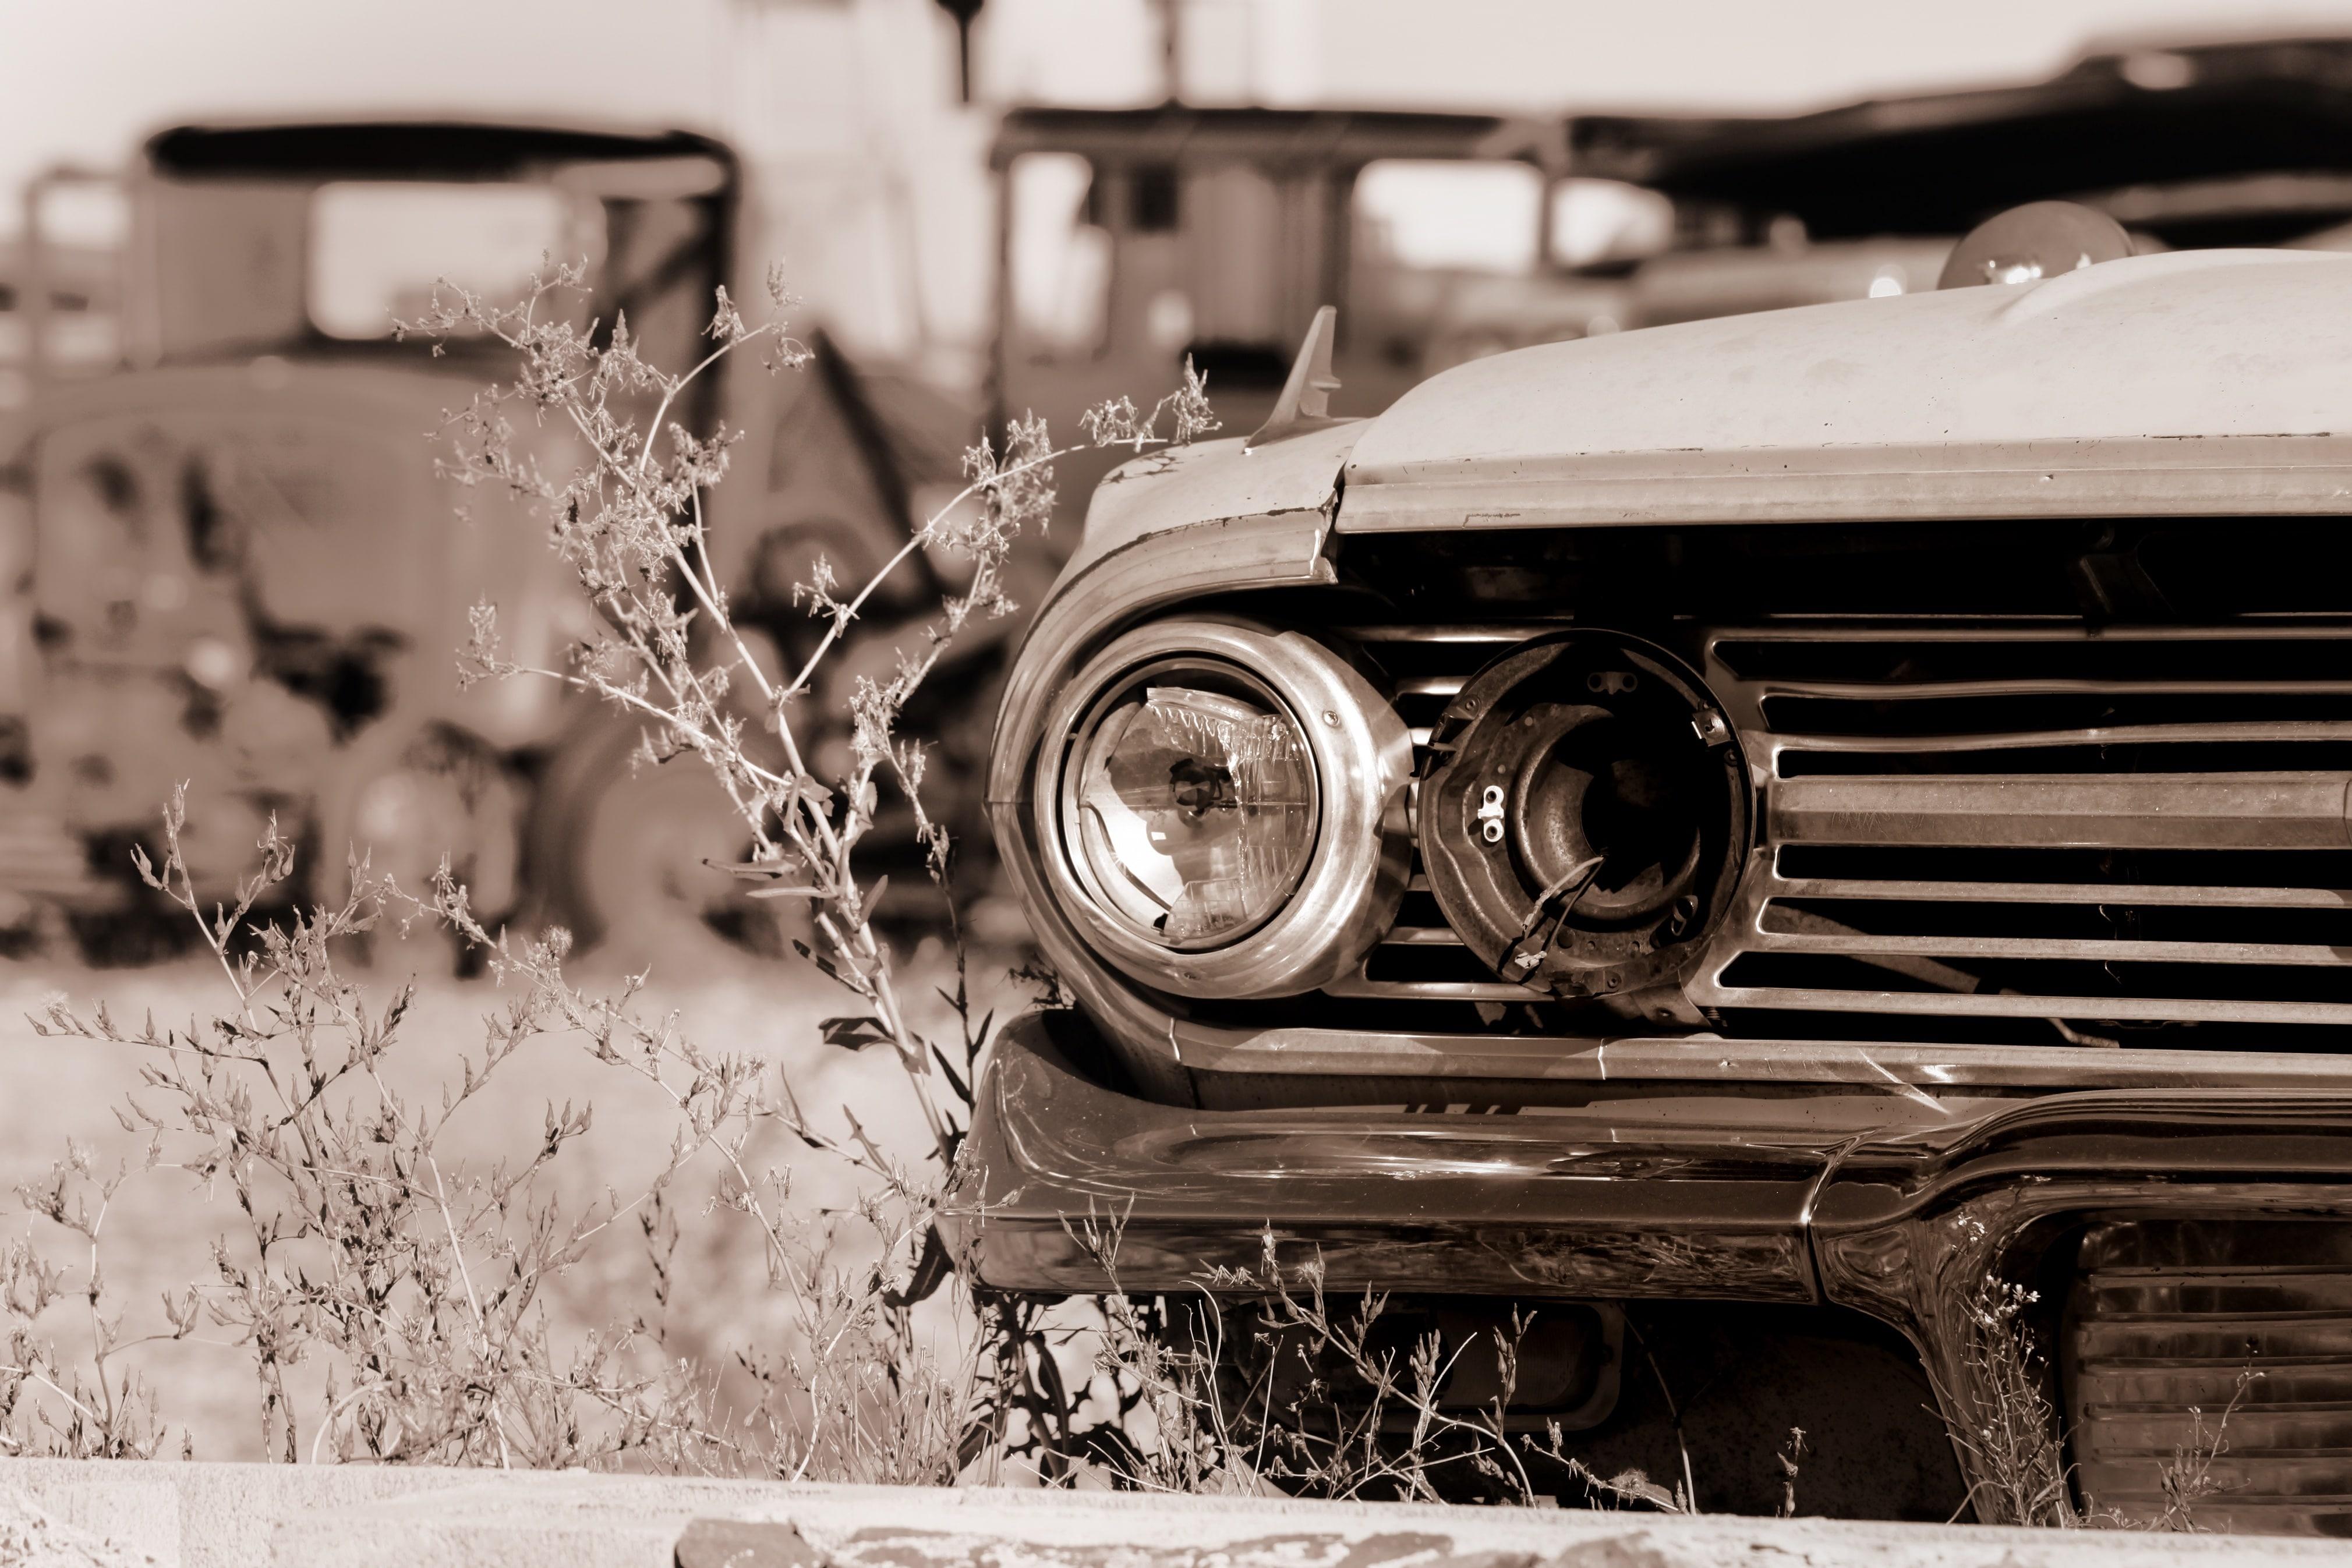 Junk Car Removal Tampa Bay | Call Us - 813 699 2278 | SellMyHoopty